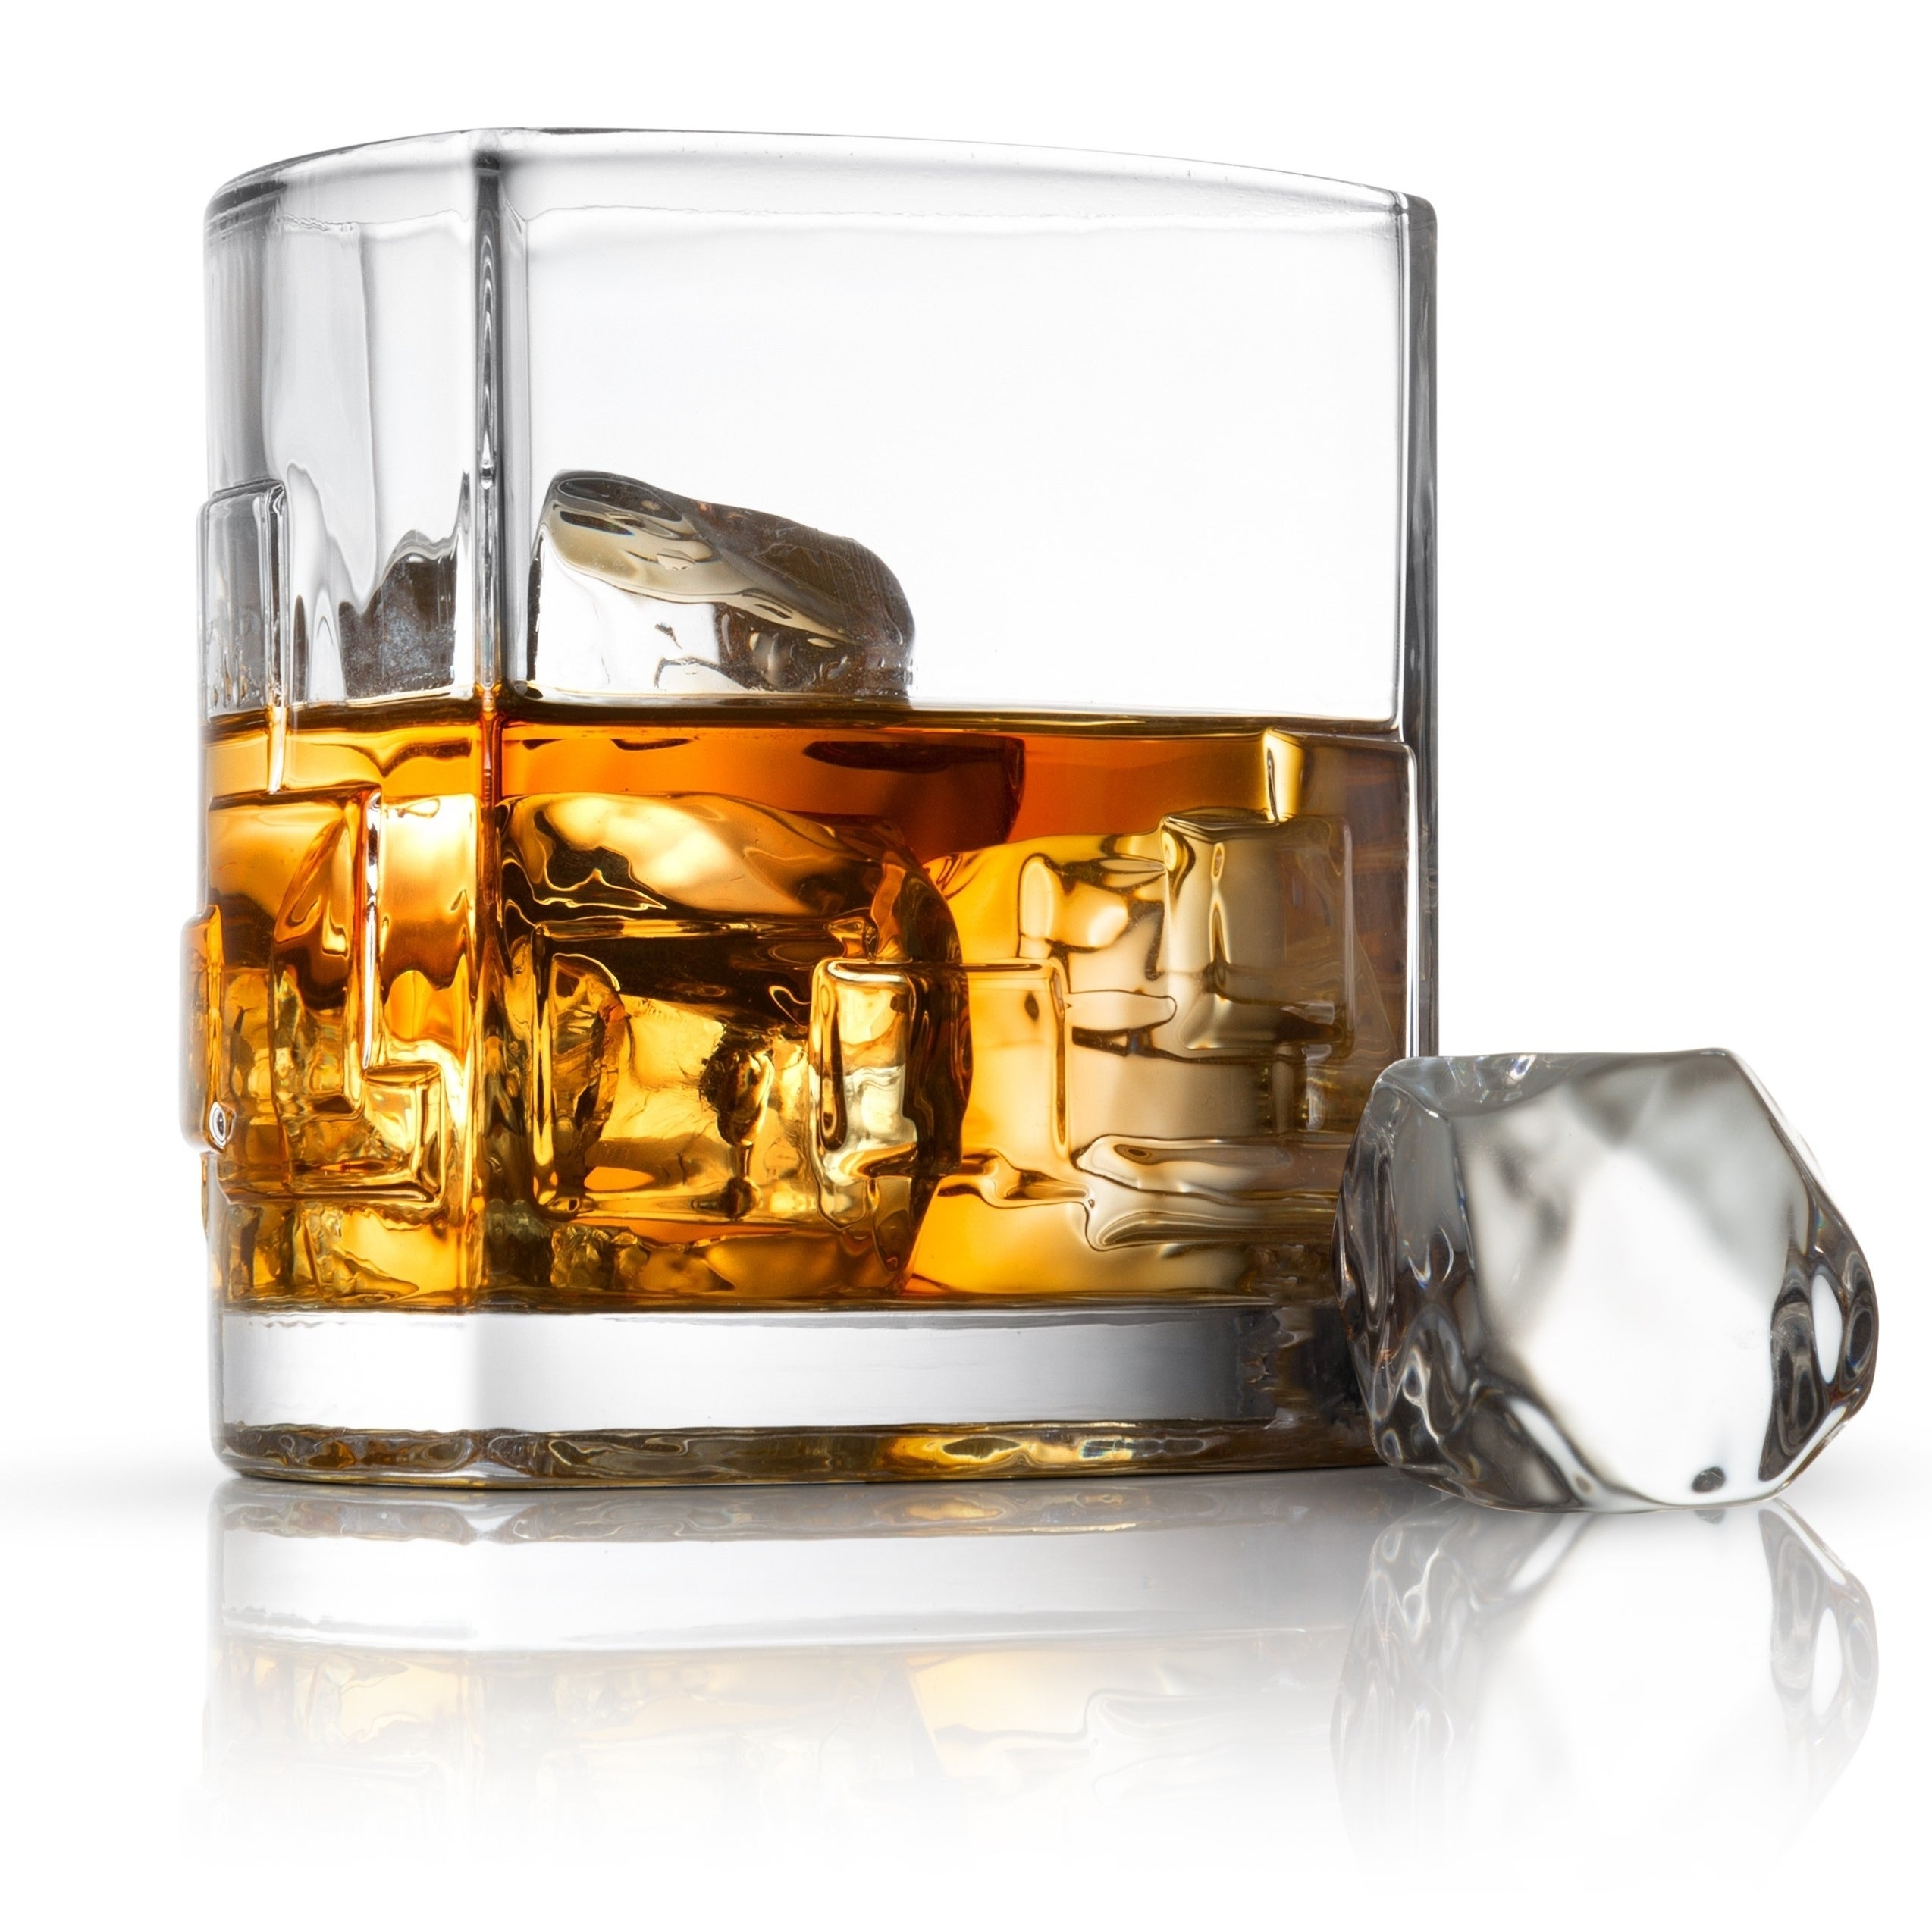 JoyJolt Black Swan Whiskey and Highball Glass collection Set of 8